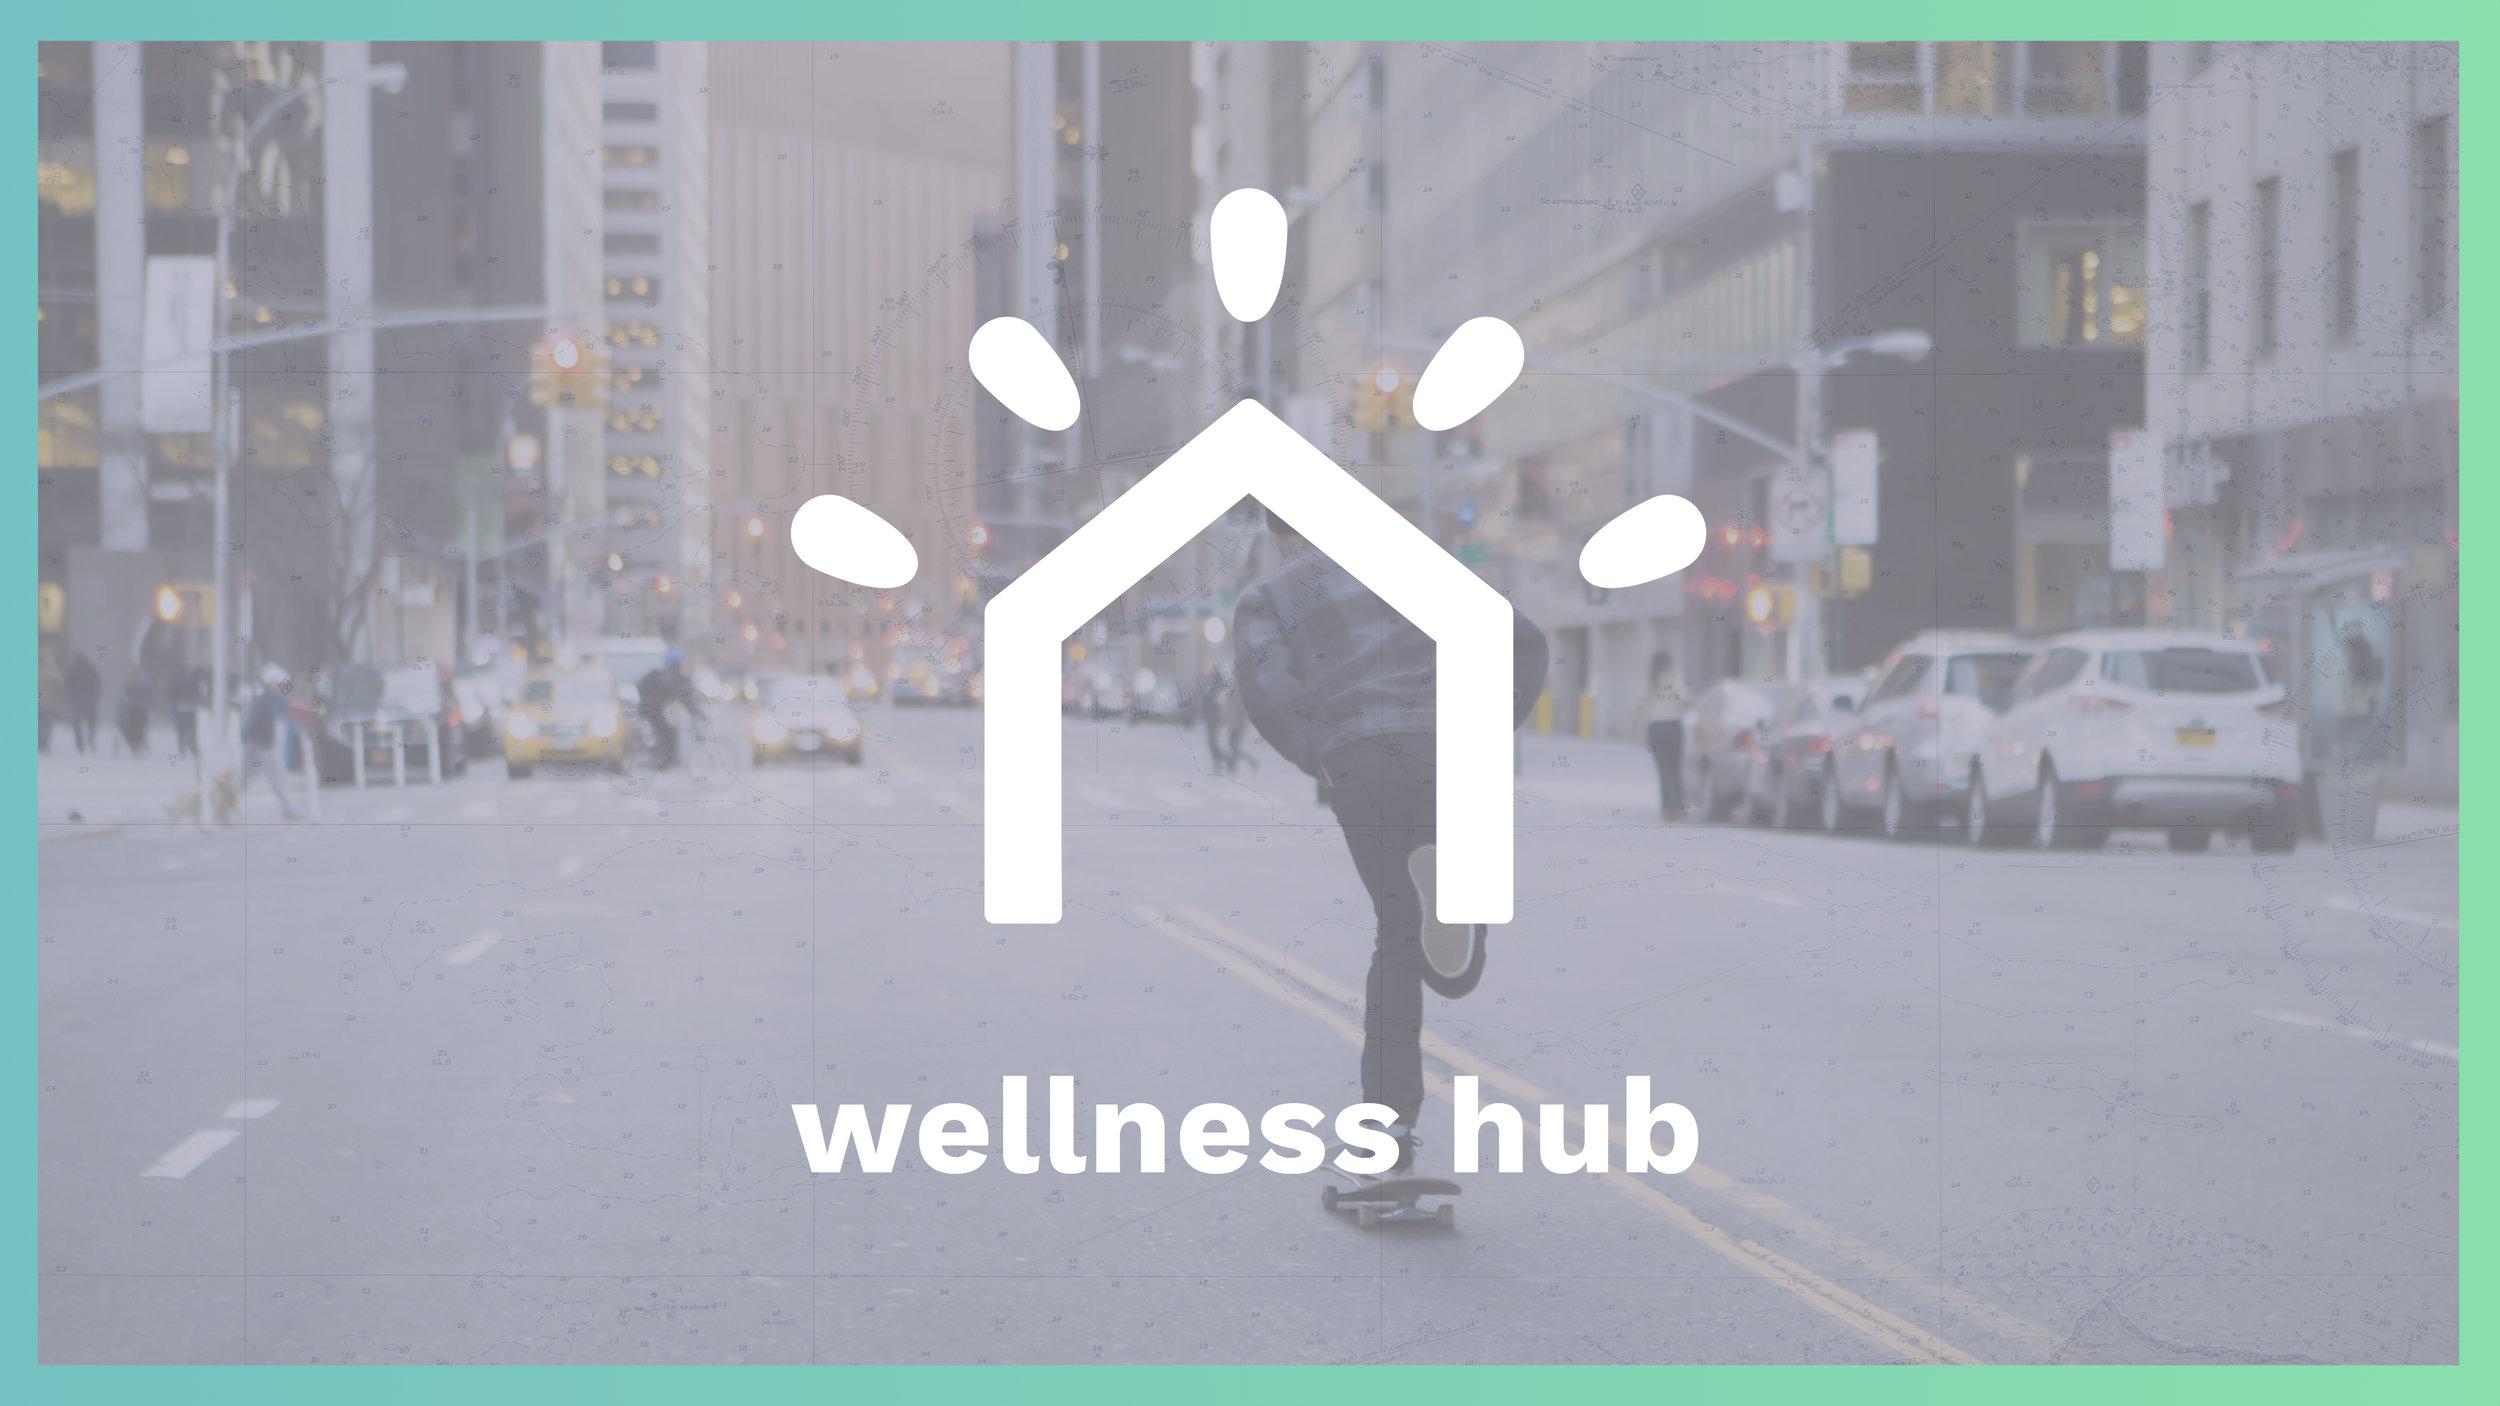 wellnesshub_mark.jpg